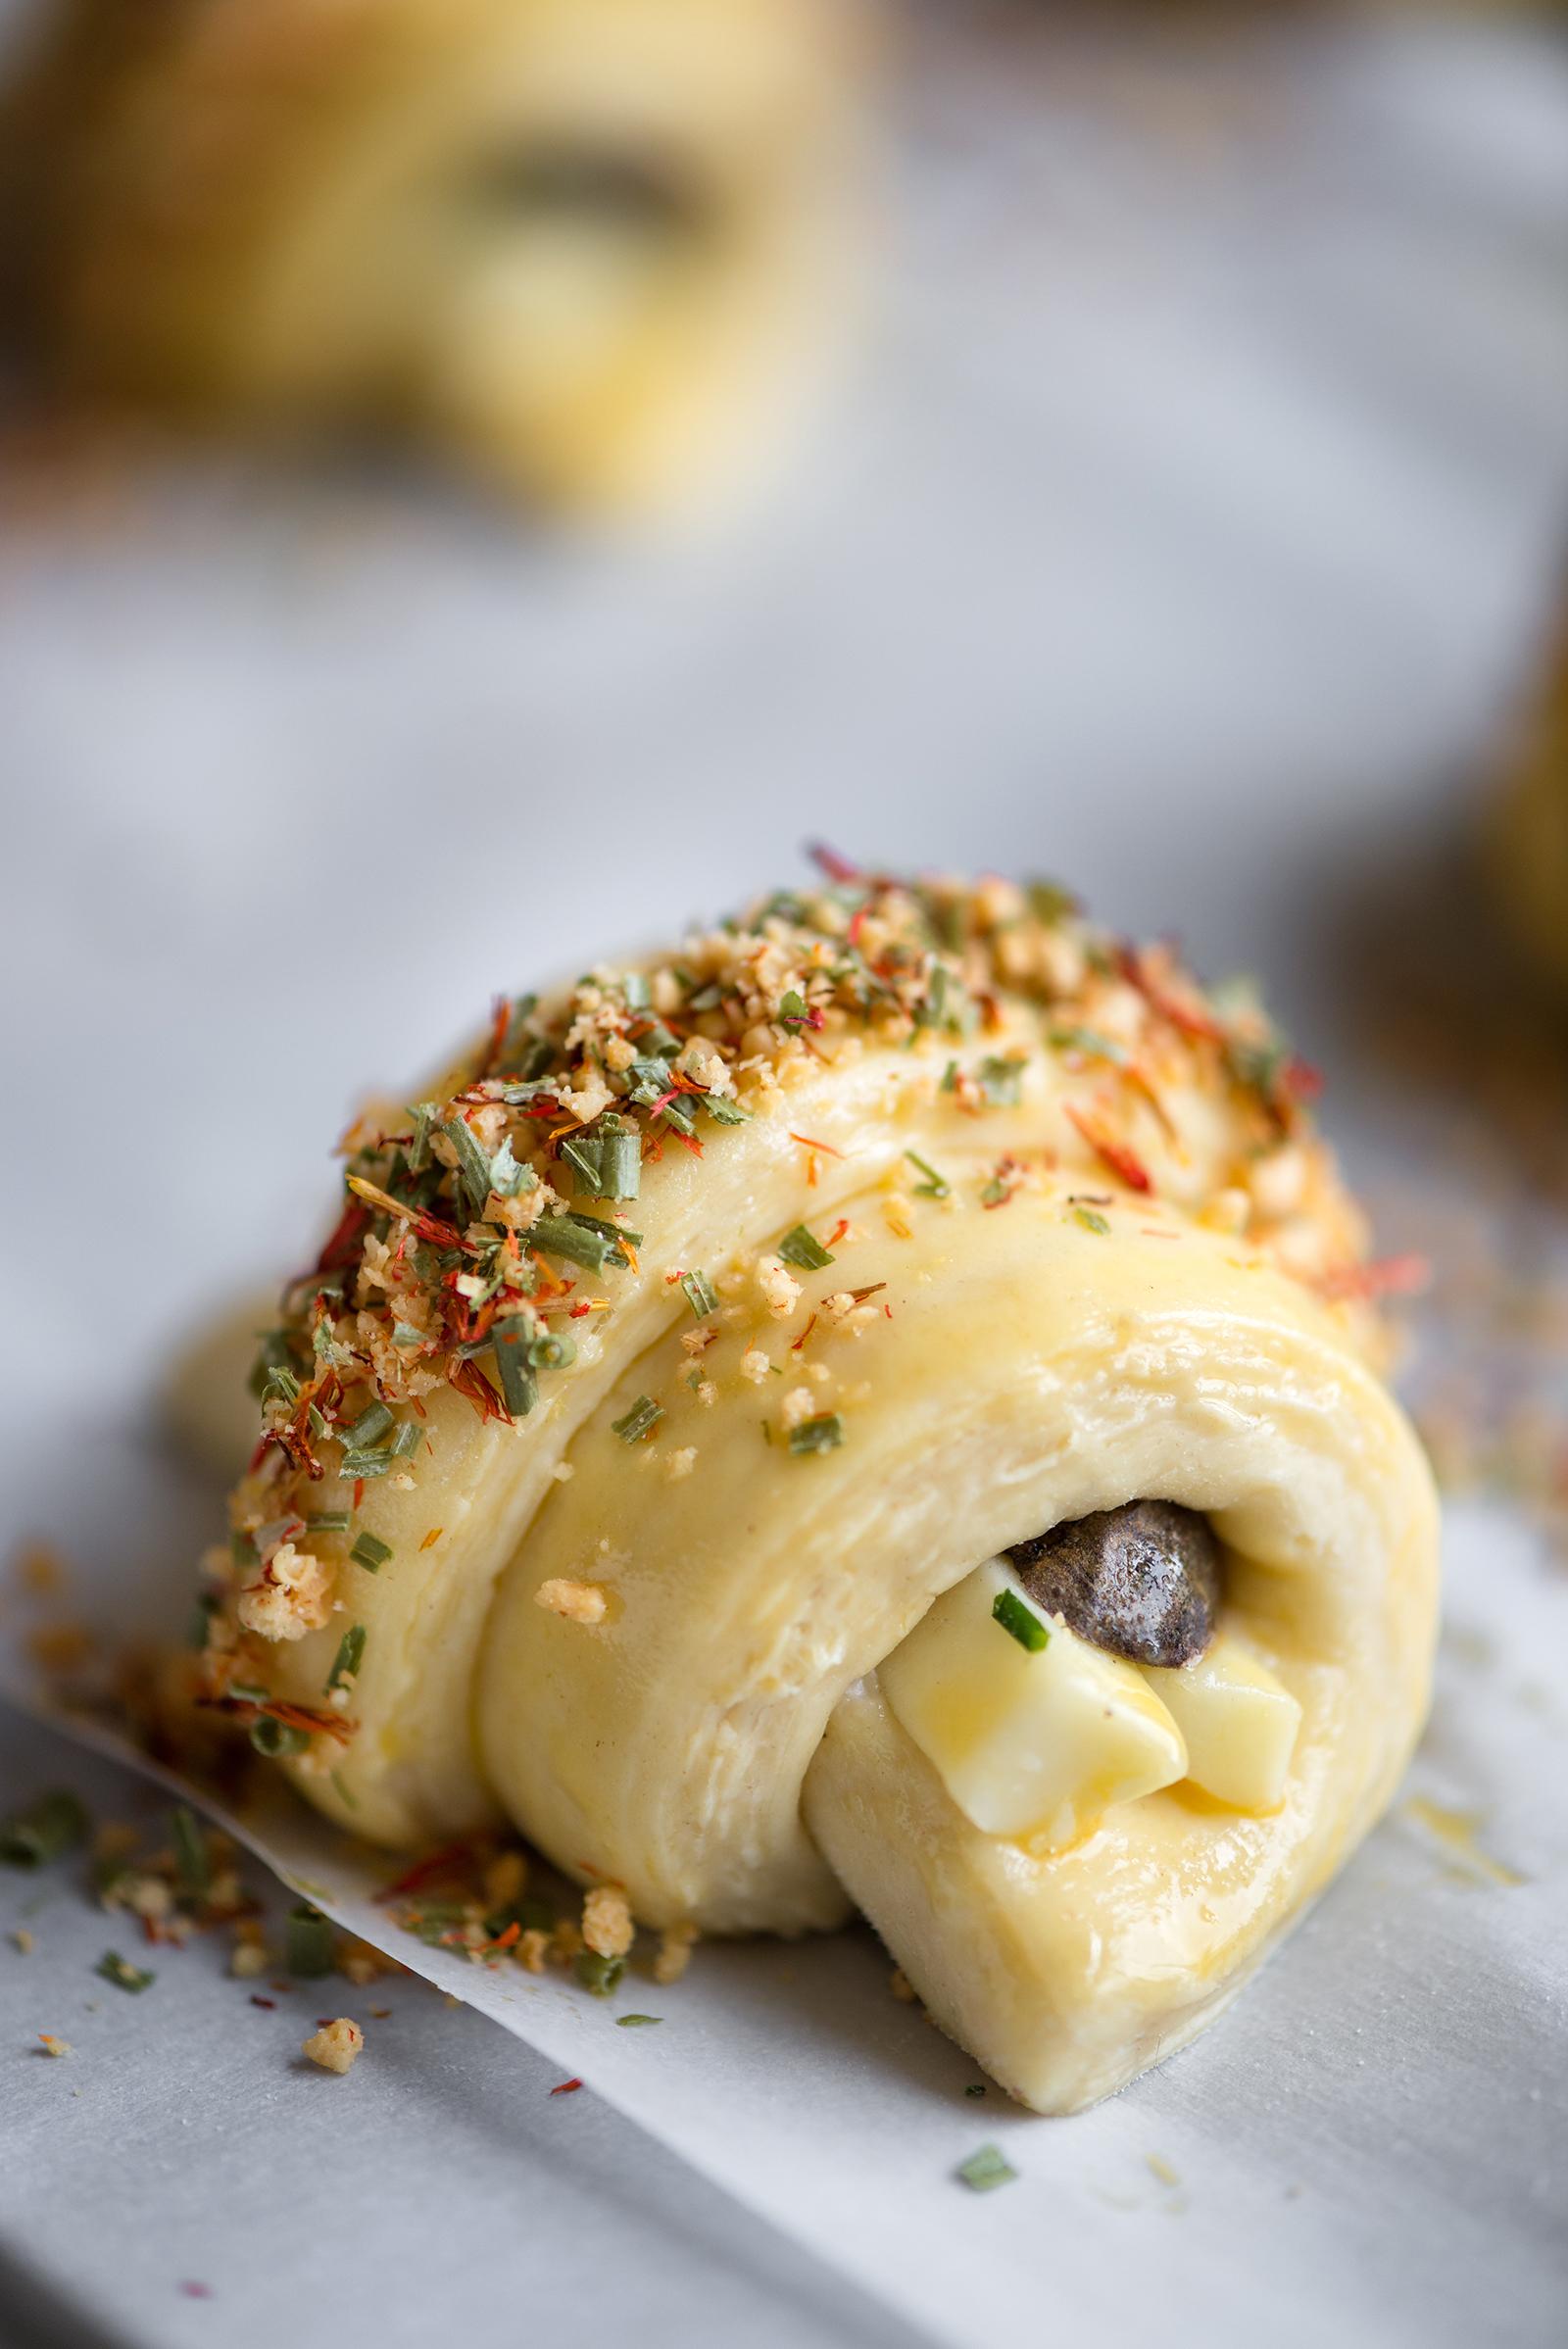 Purple Potato, Asparagus And Havarti Croissant | Now, Forager | Teresa Floyd